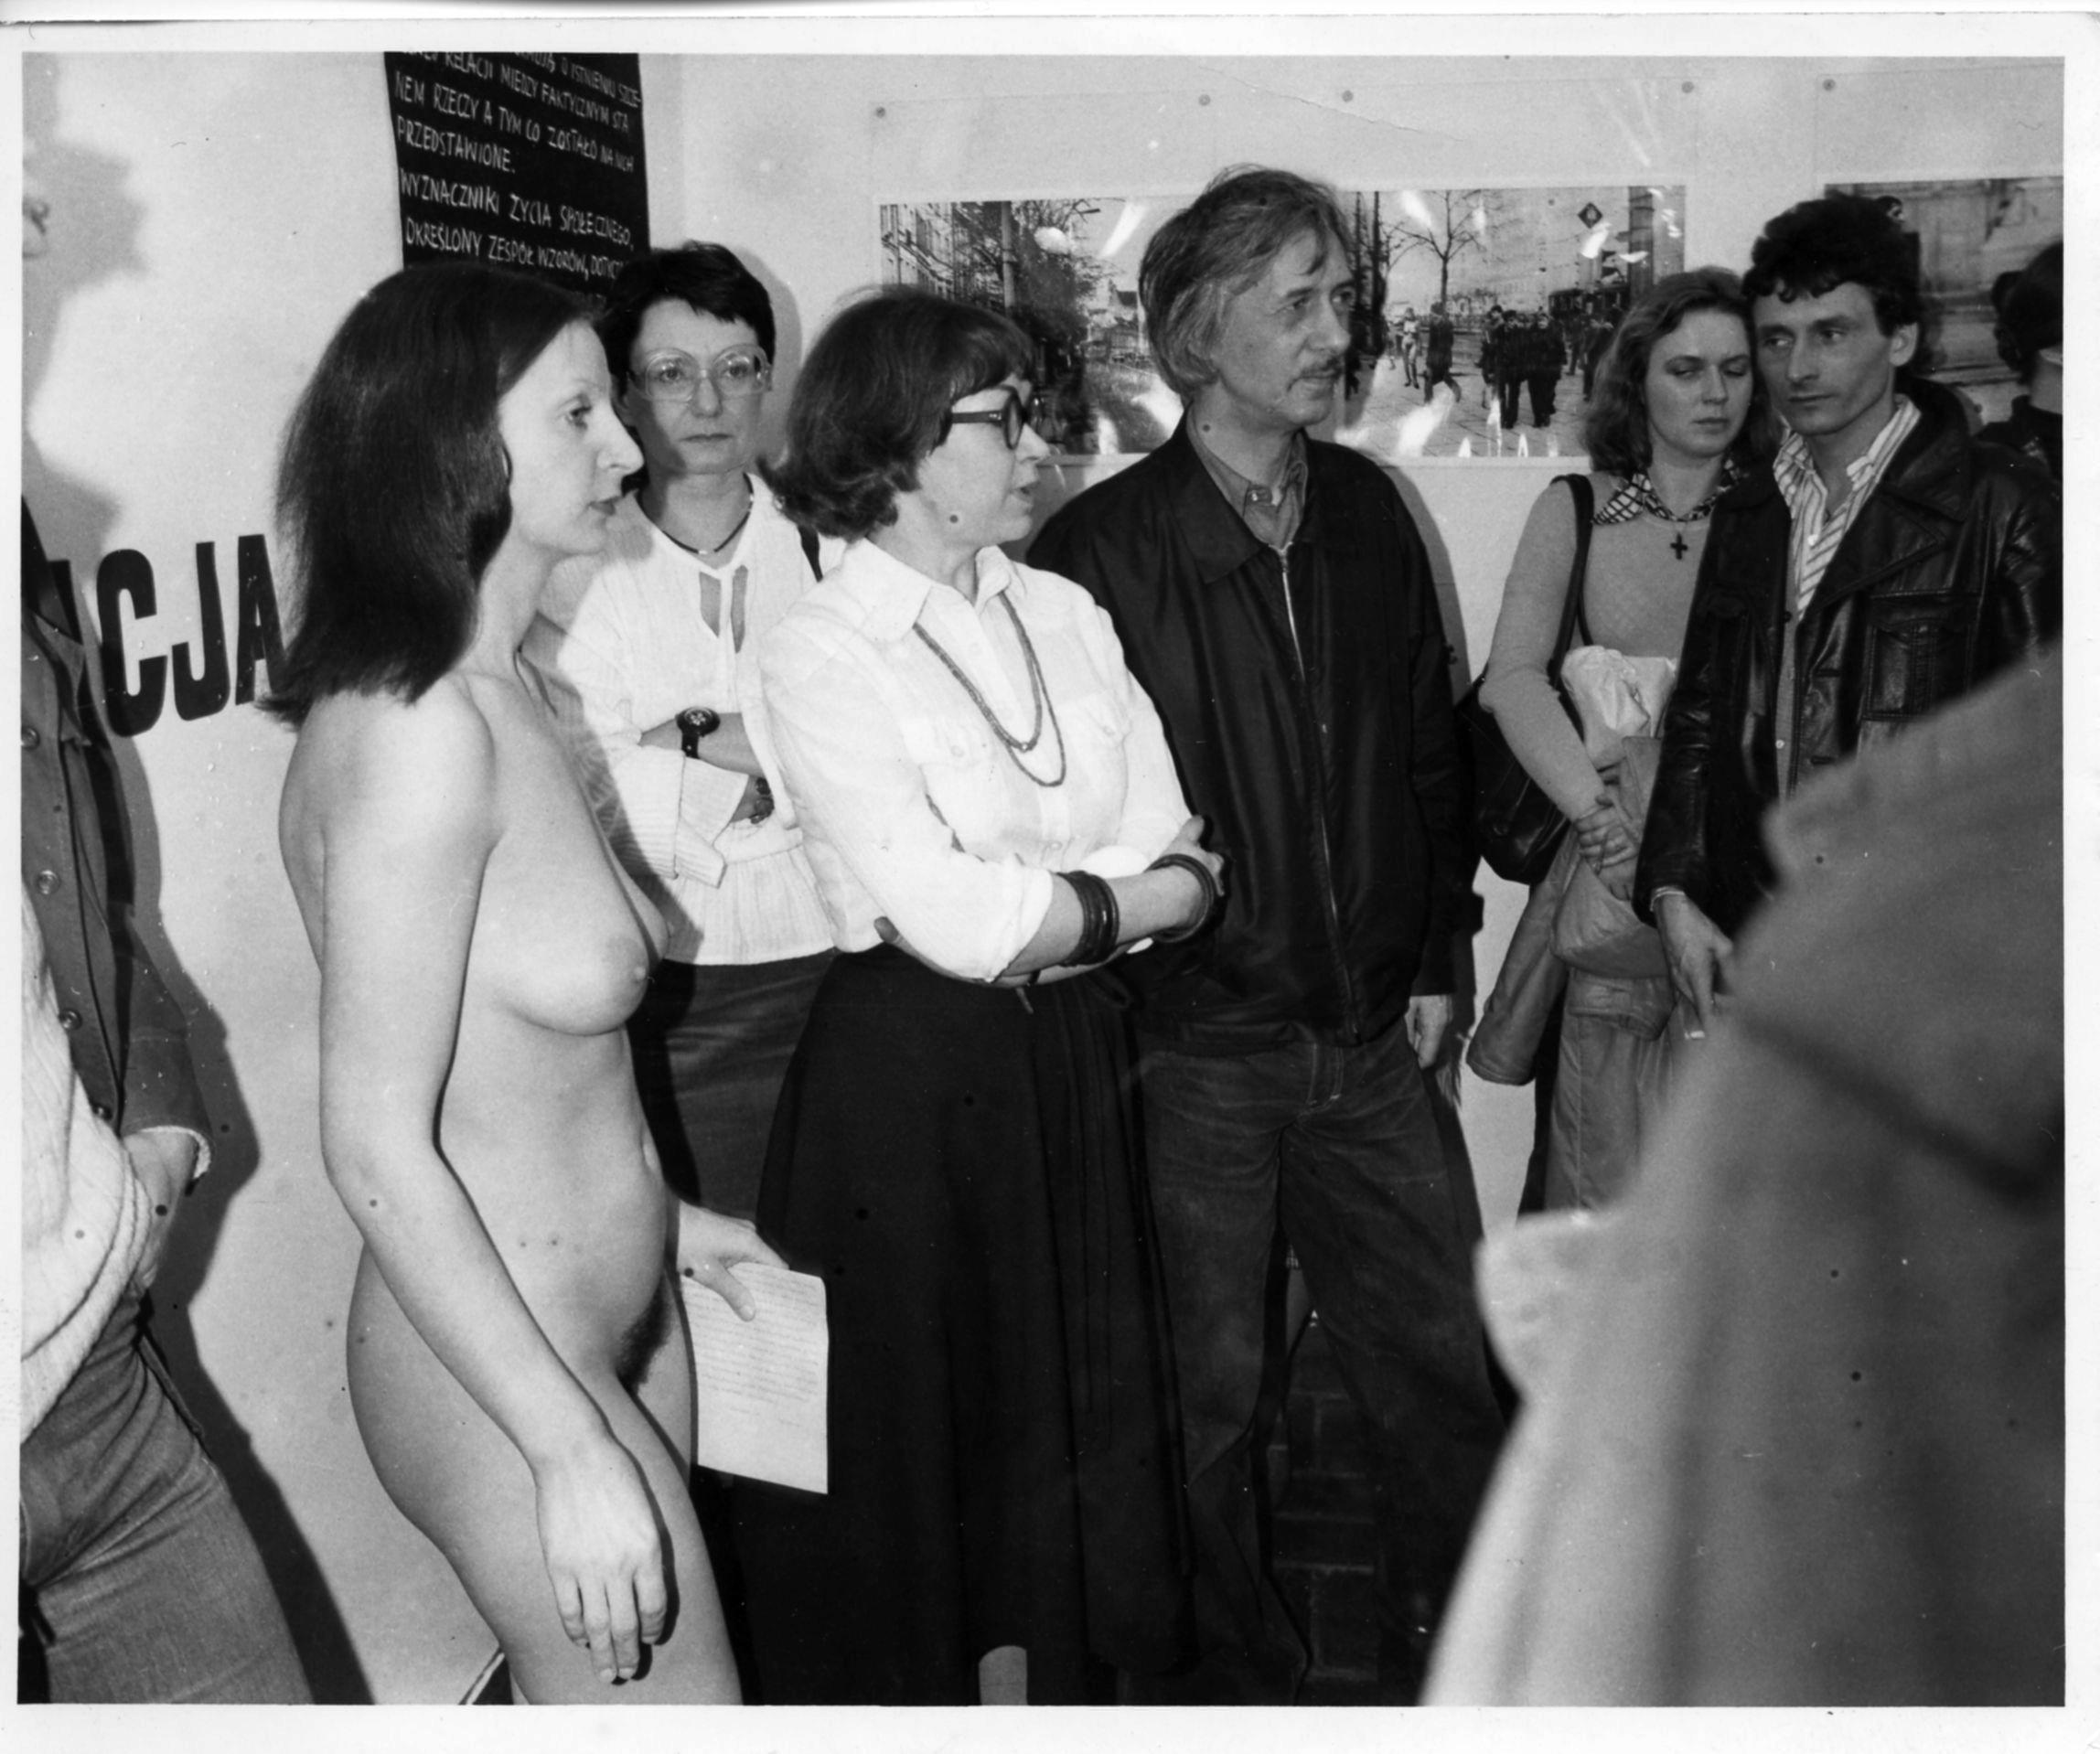 Ewa Partum, Samoidentyfikacja, photo by Marek Grygiel, courtesy of Artists' Archives of The Museum of Modern Art in Warsaw.